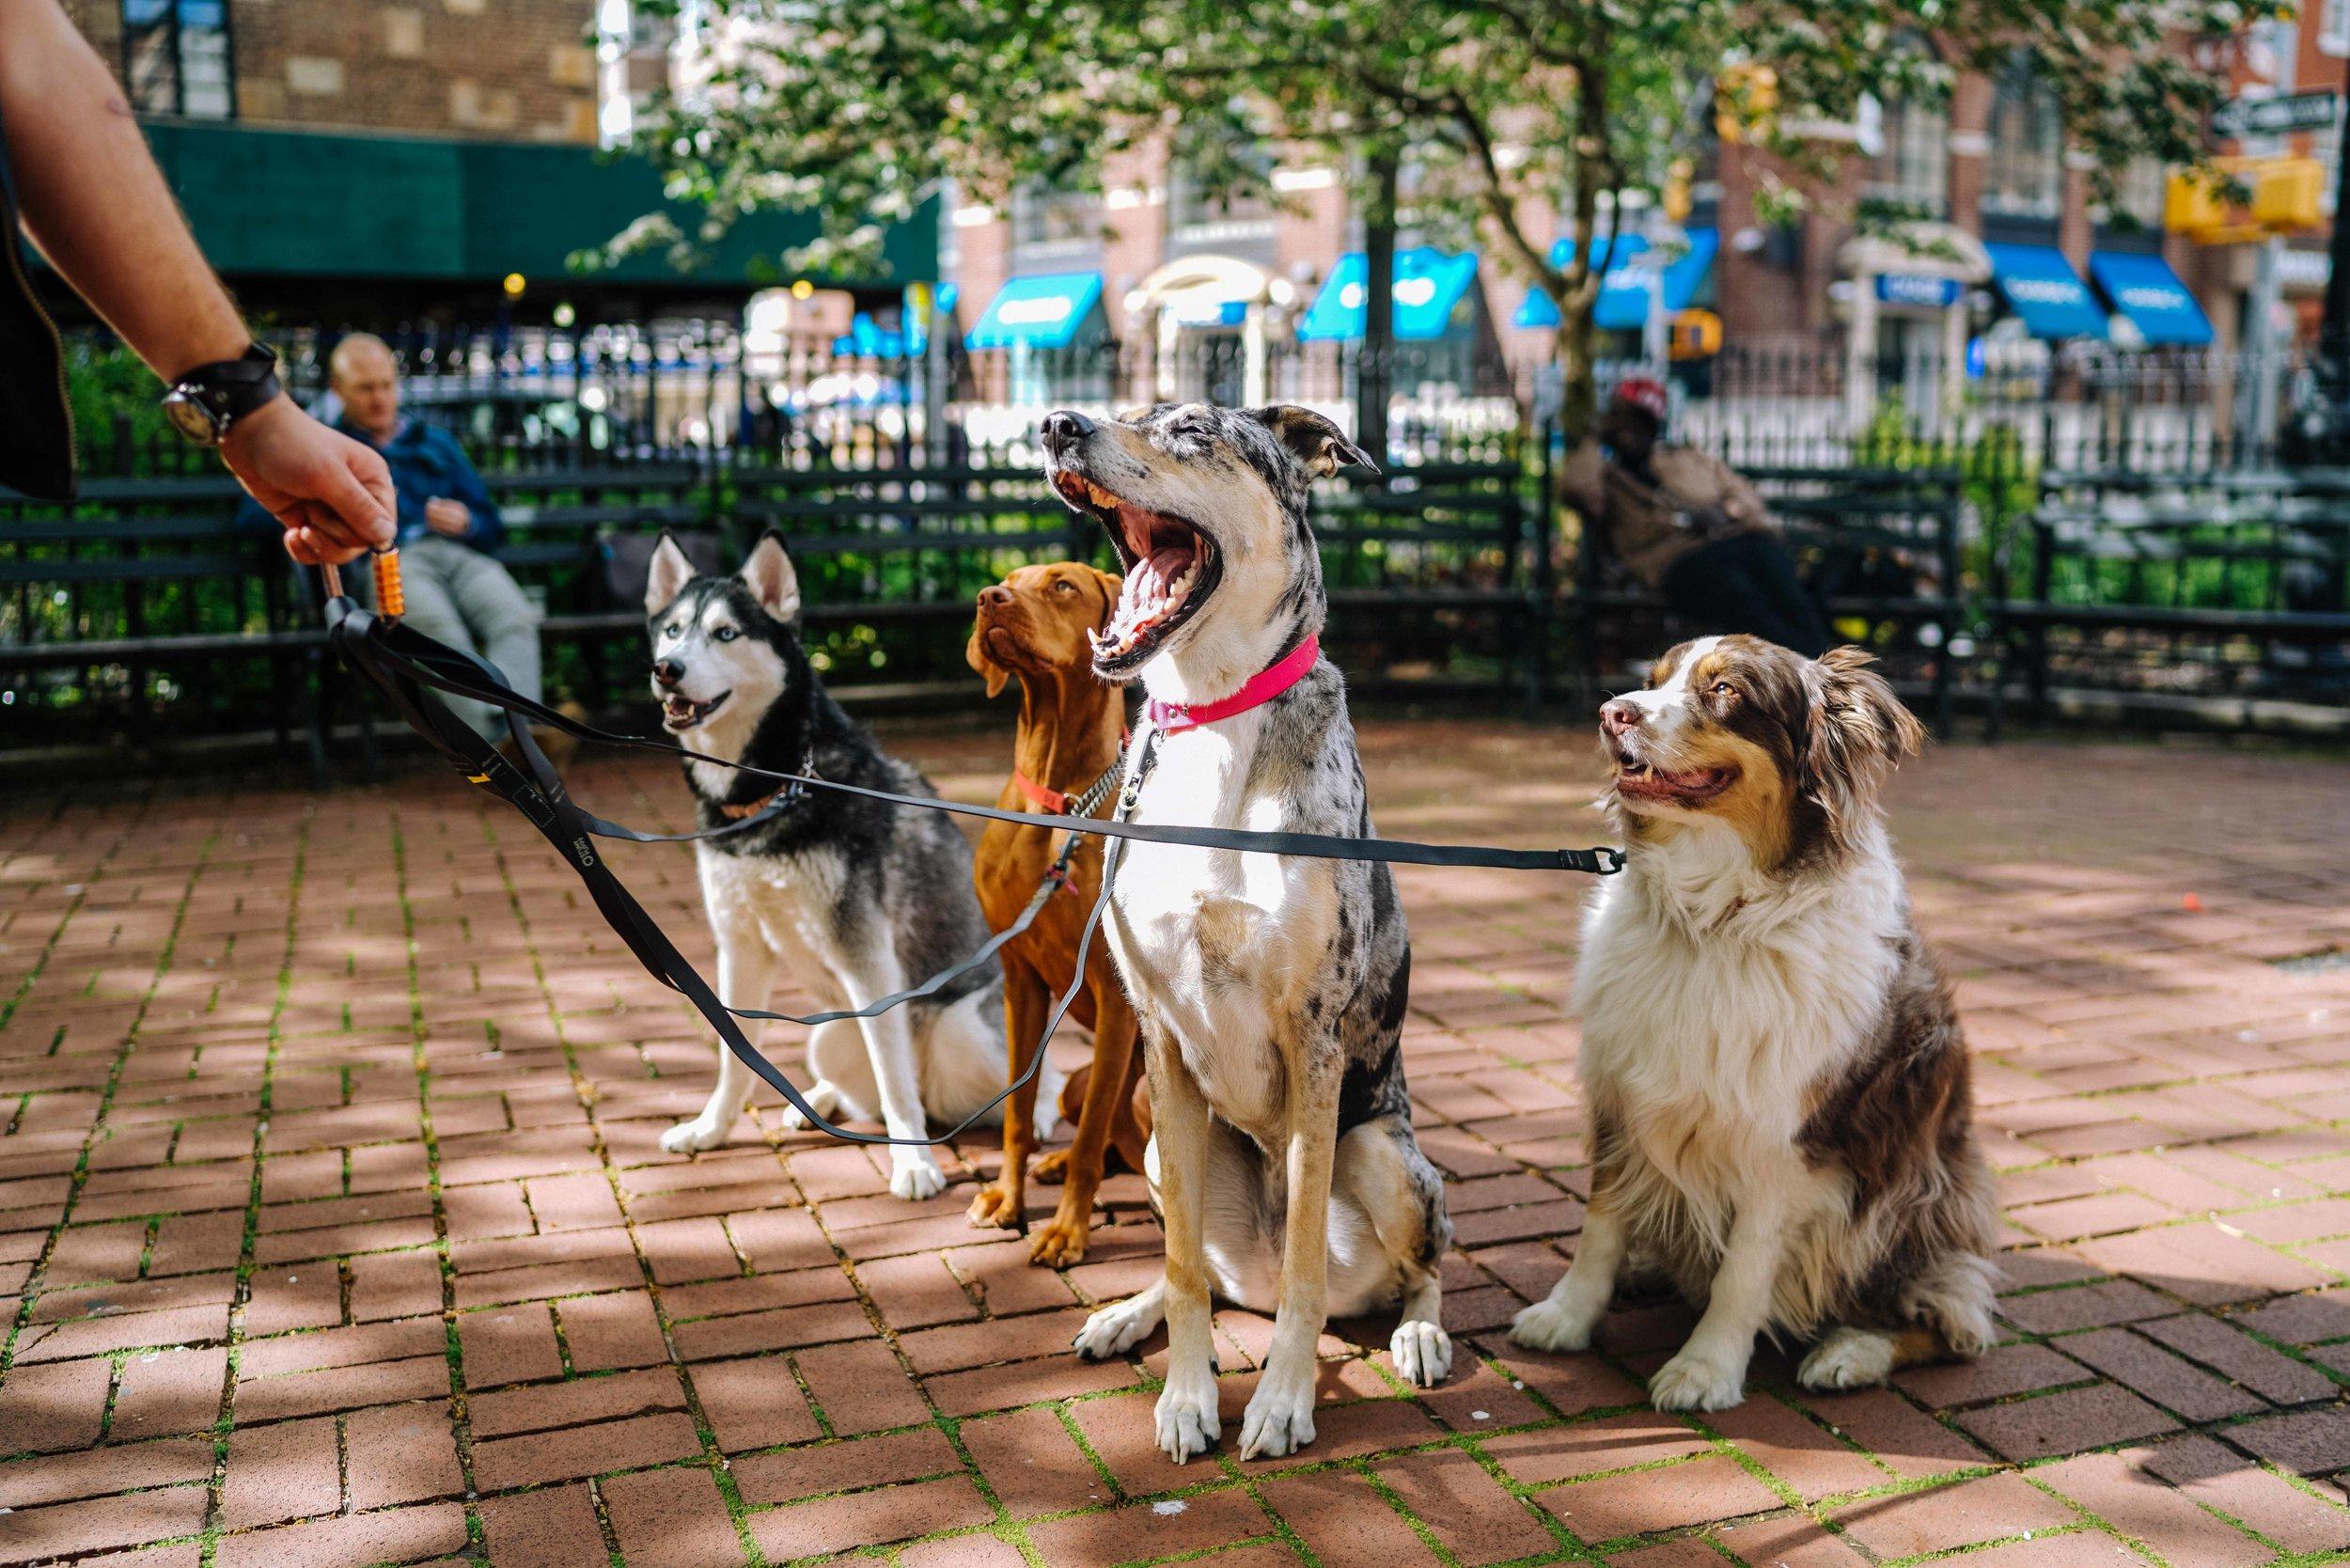 animal-canine-close-up-171297.jpg